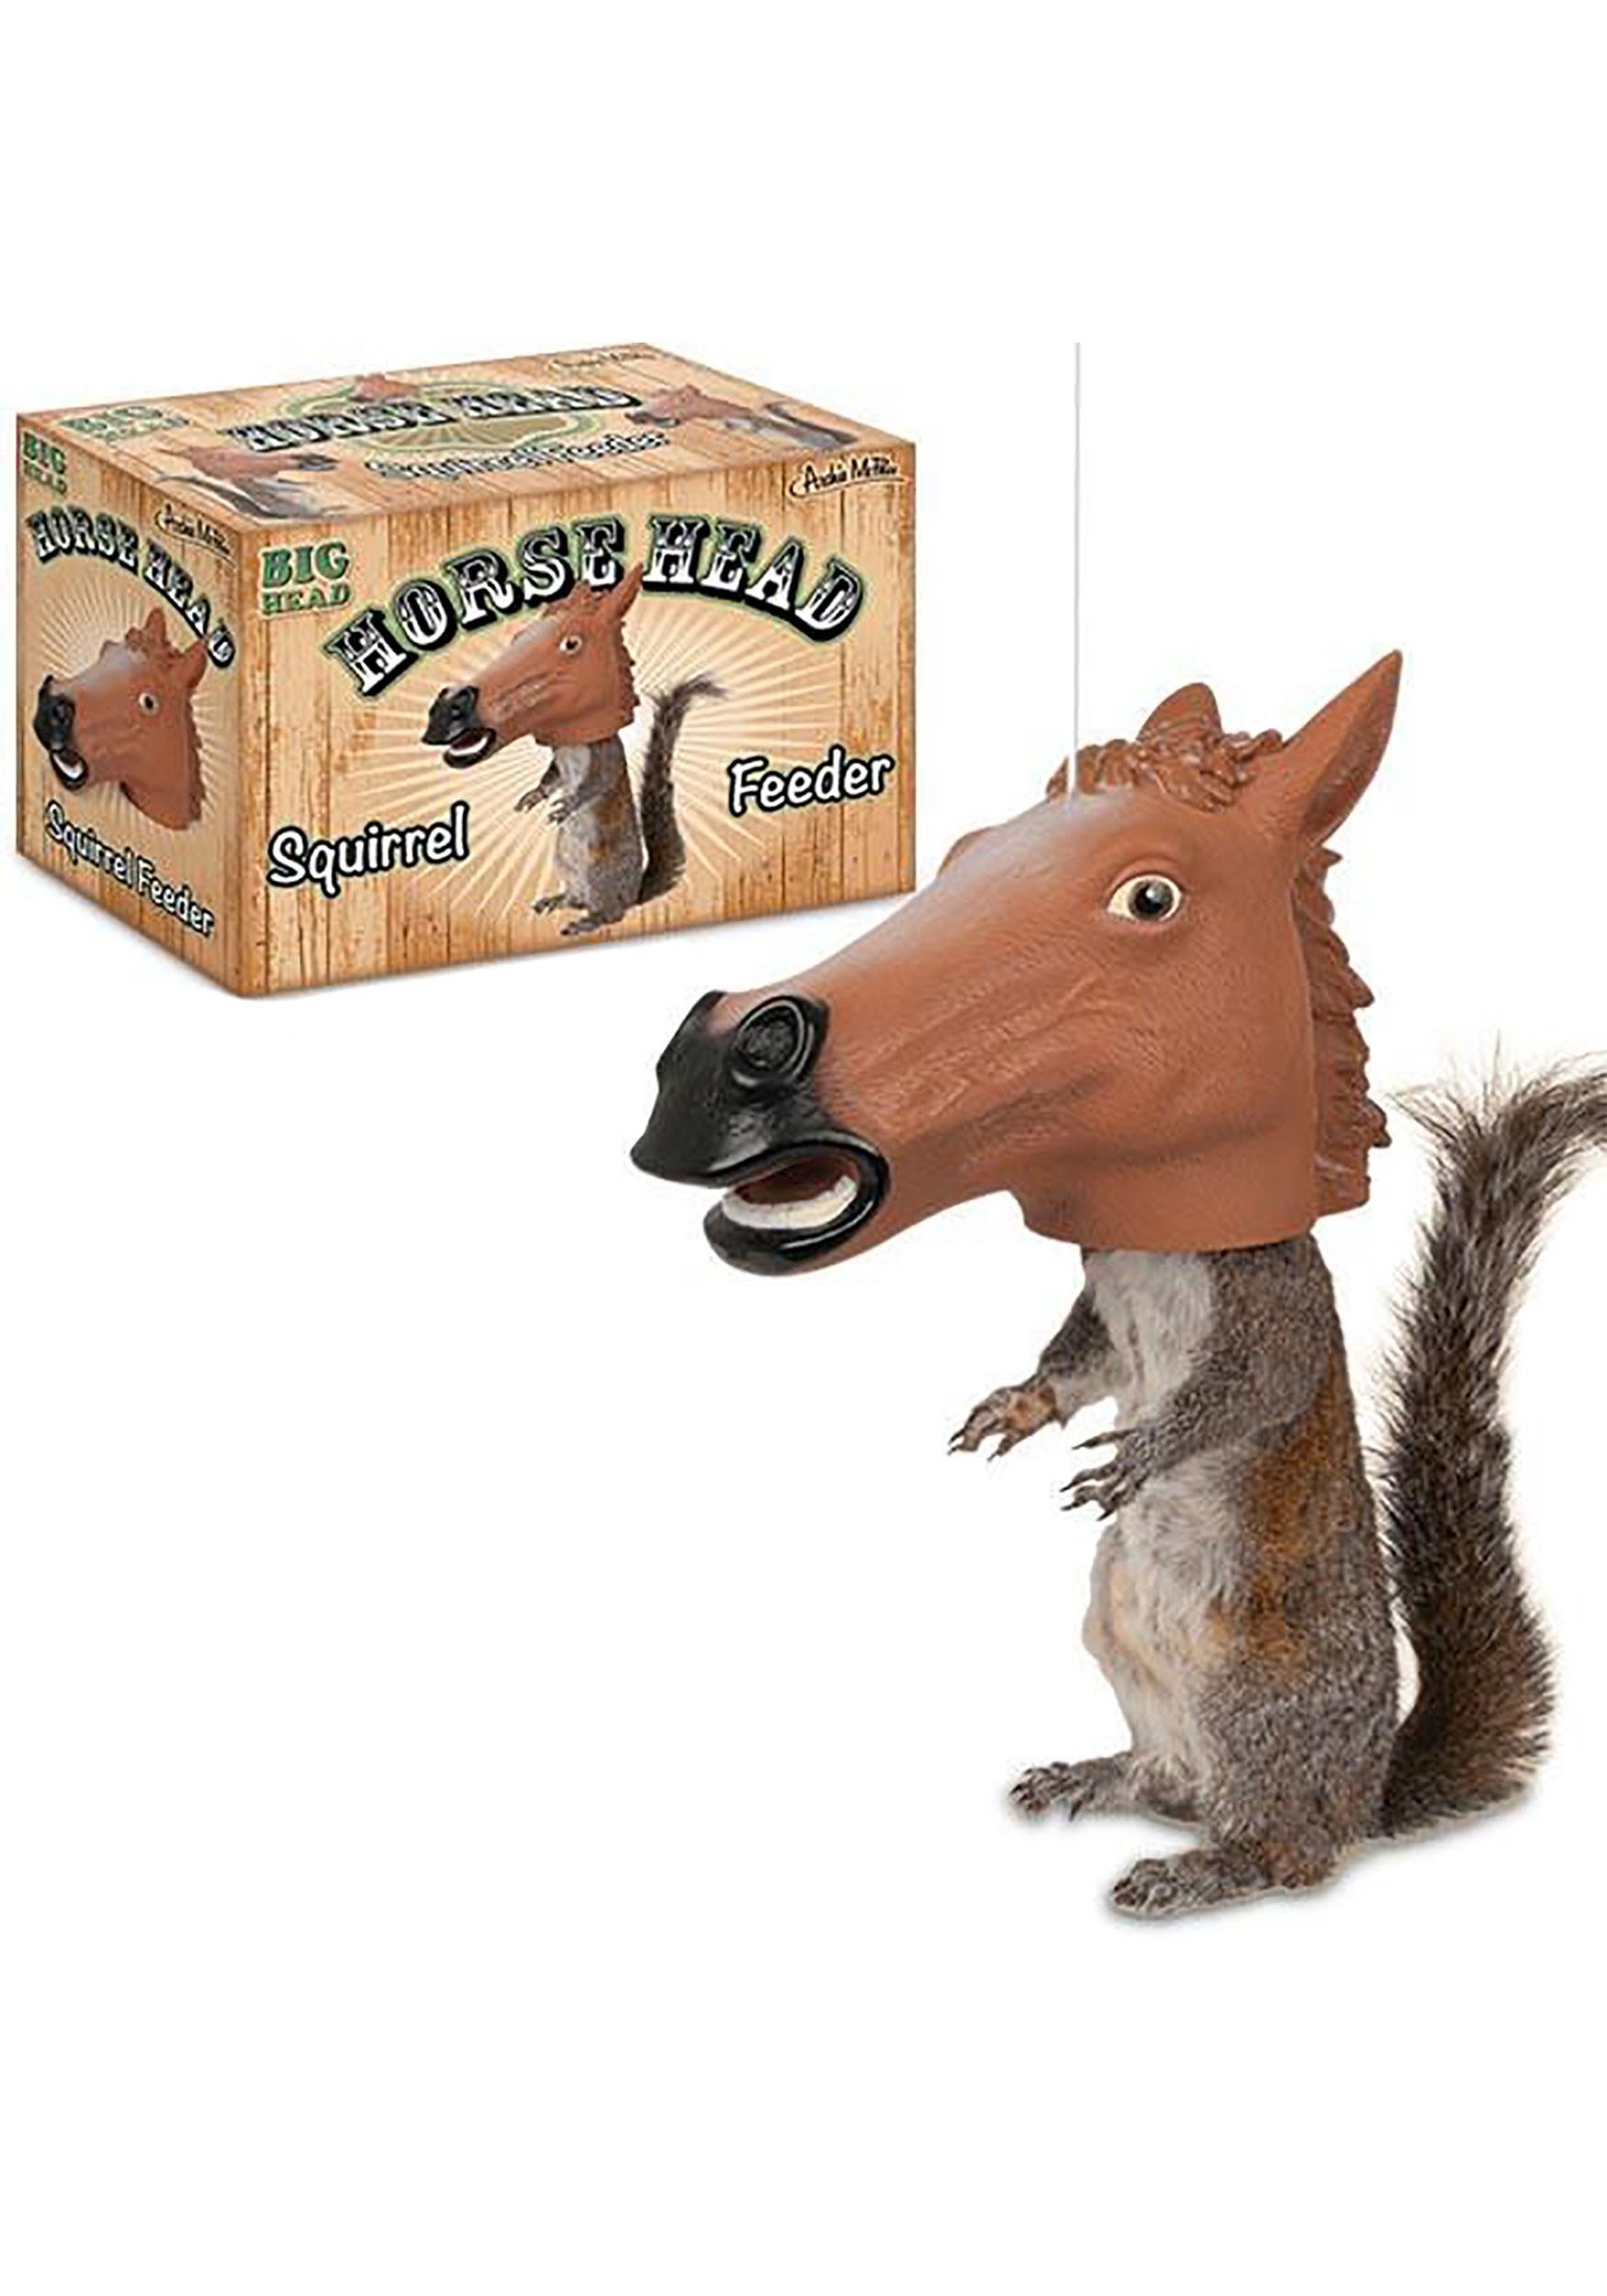 Horse_Head_Vinyl_Squirrel_Feeder